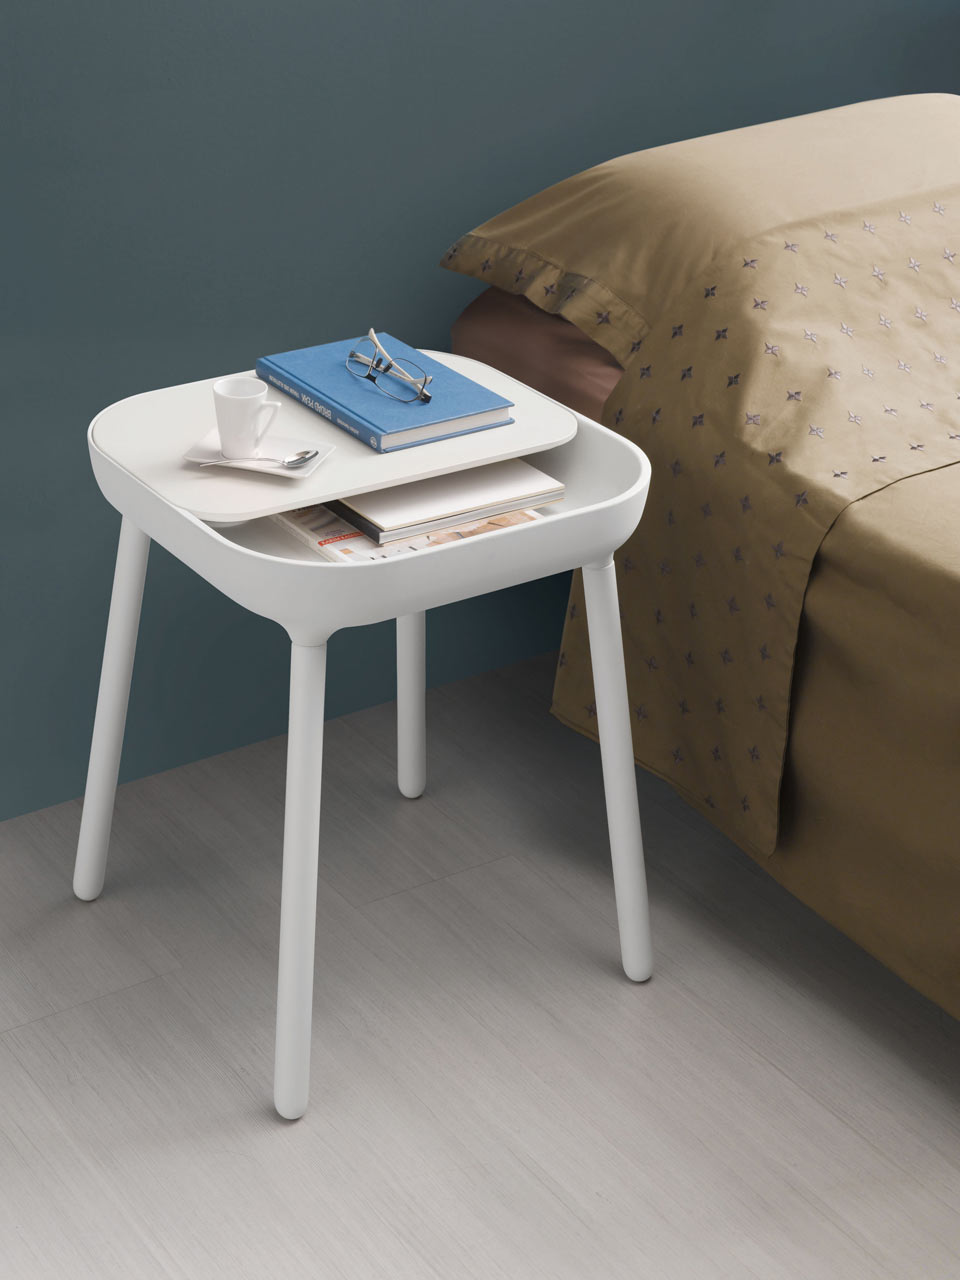 App-Side-Table-hisheji (7)